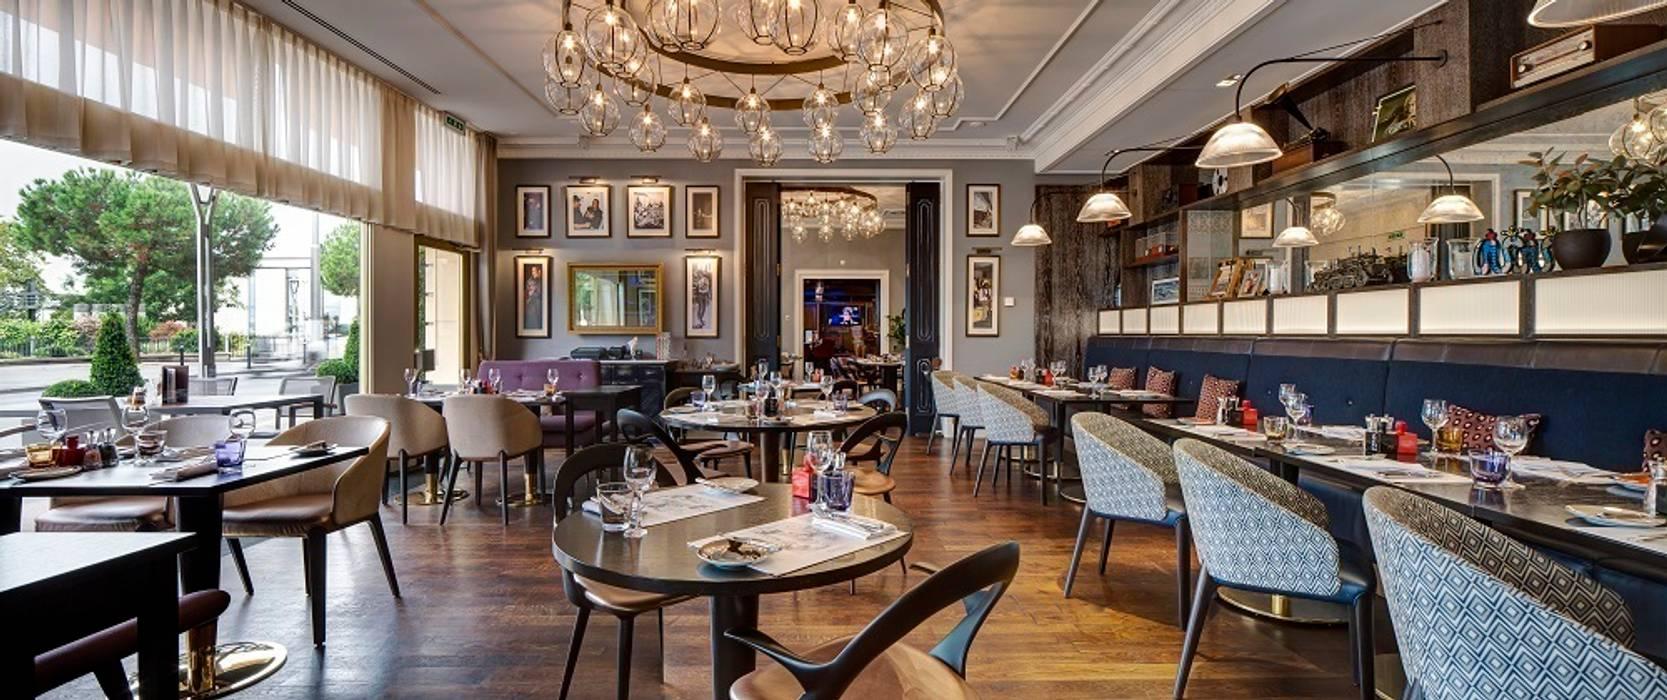 Montreux Jazz Café Fairmont by Aedas Interiors:  Gastronomy by Aedas,